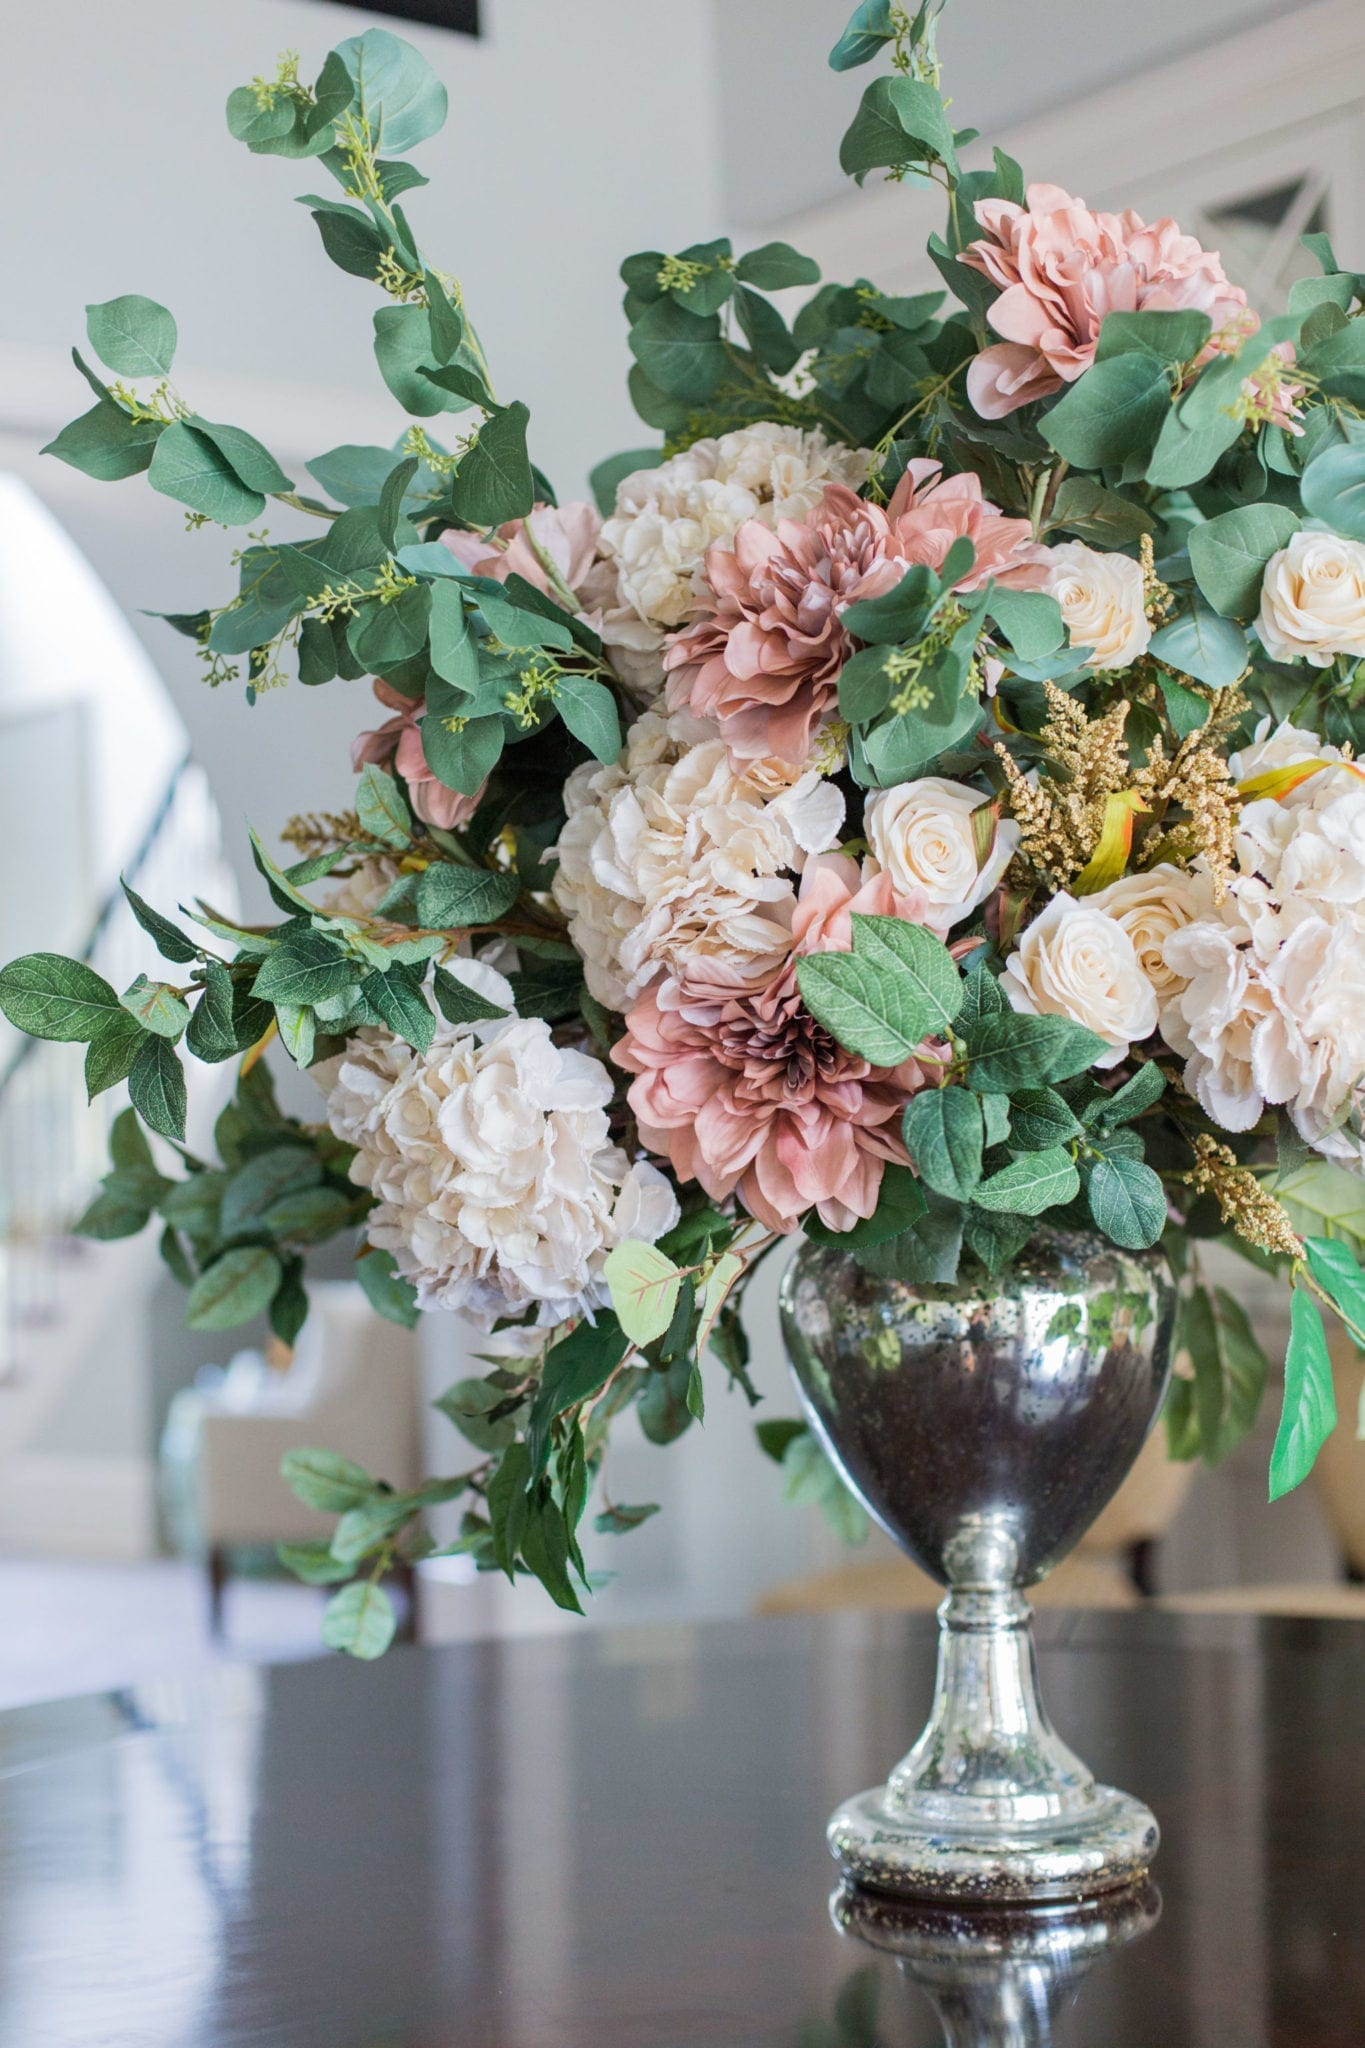 Flower arrangement ideas for home.